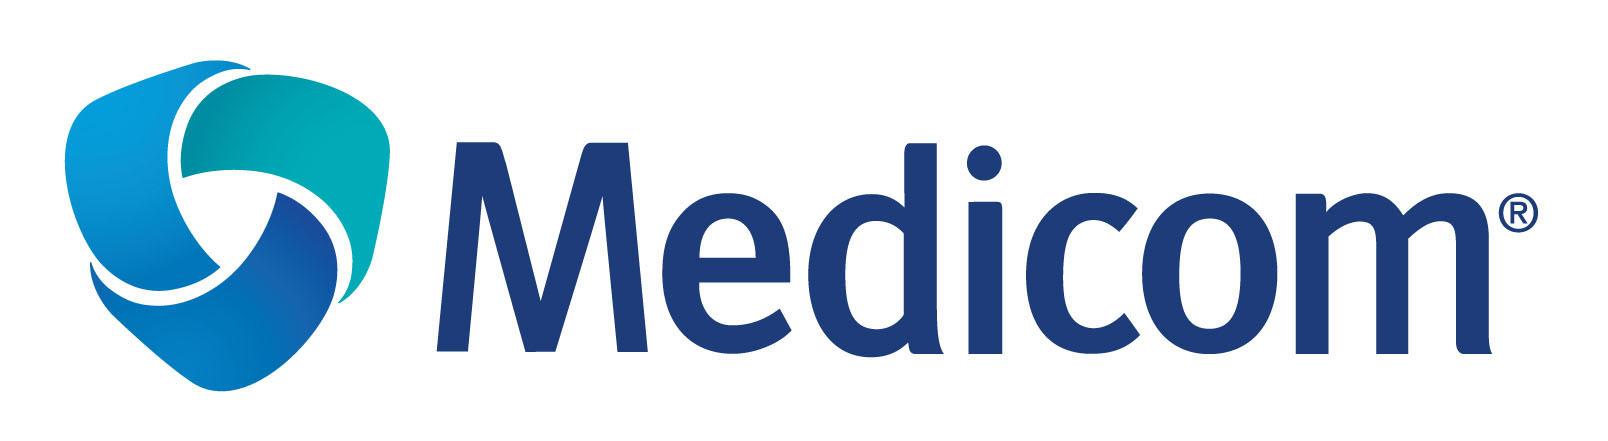 Medicom Logo | Logos Rates